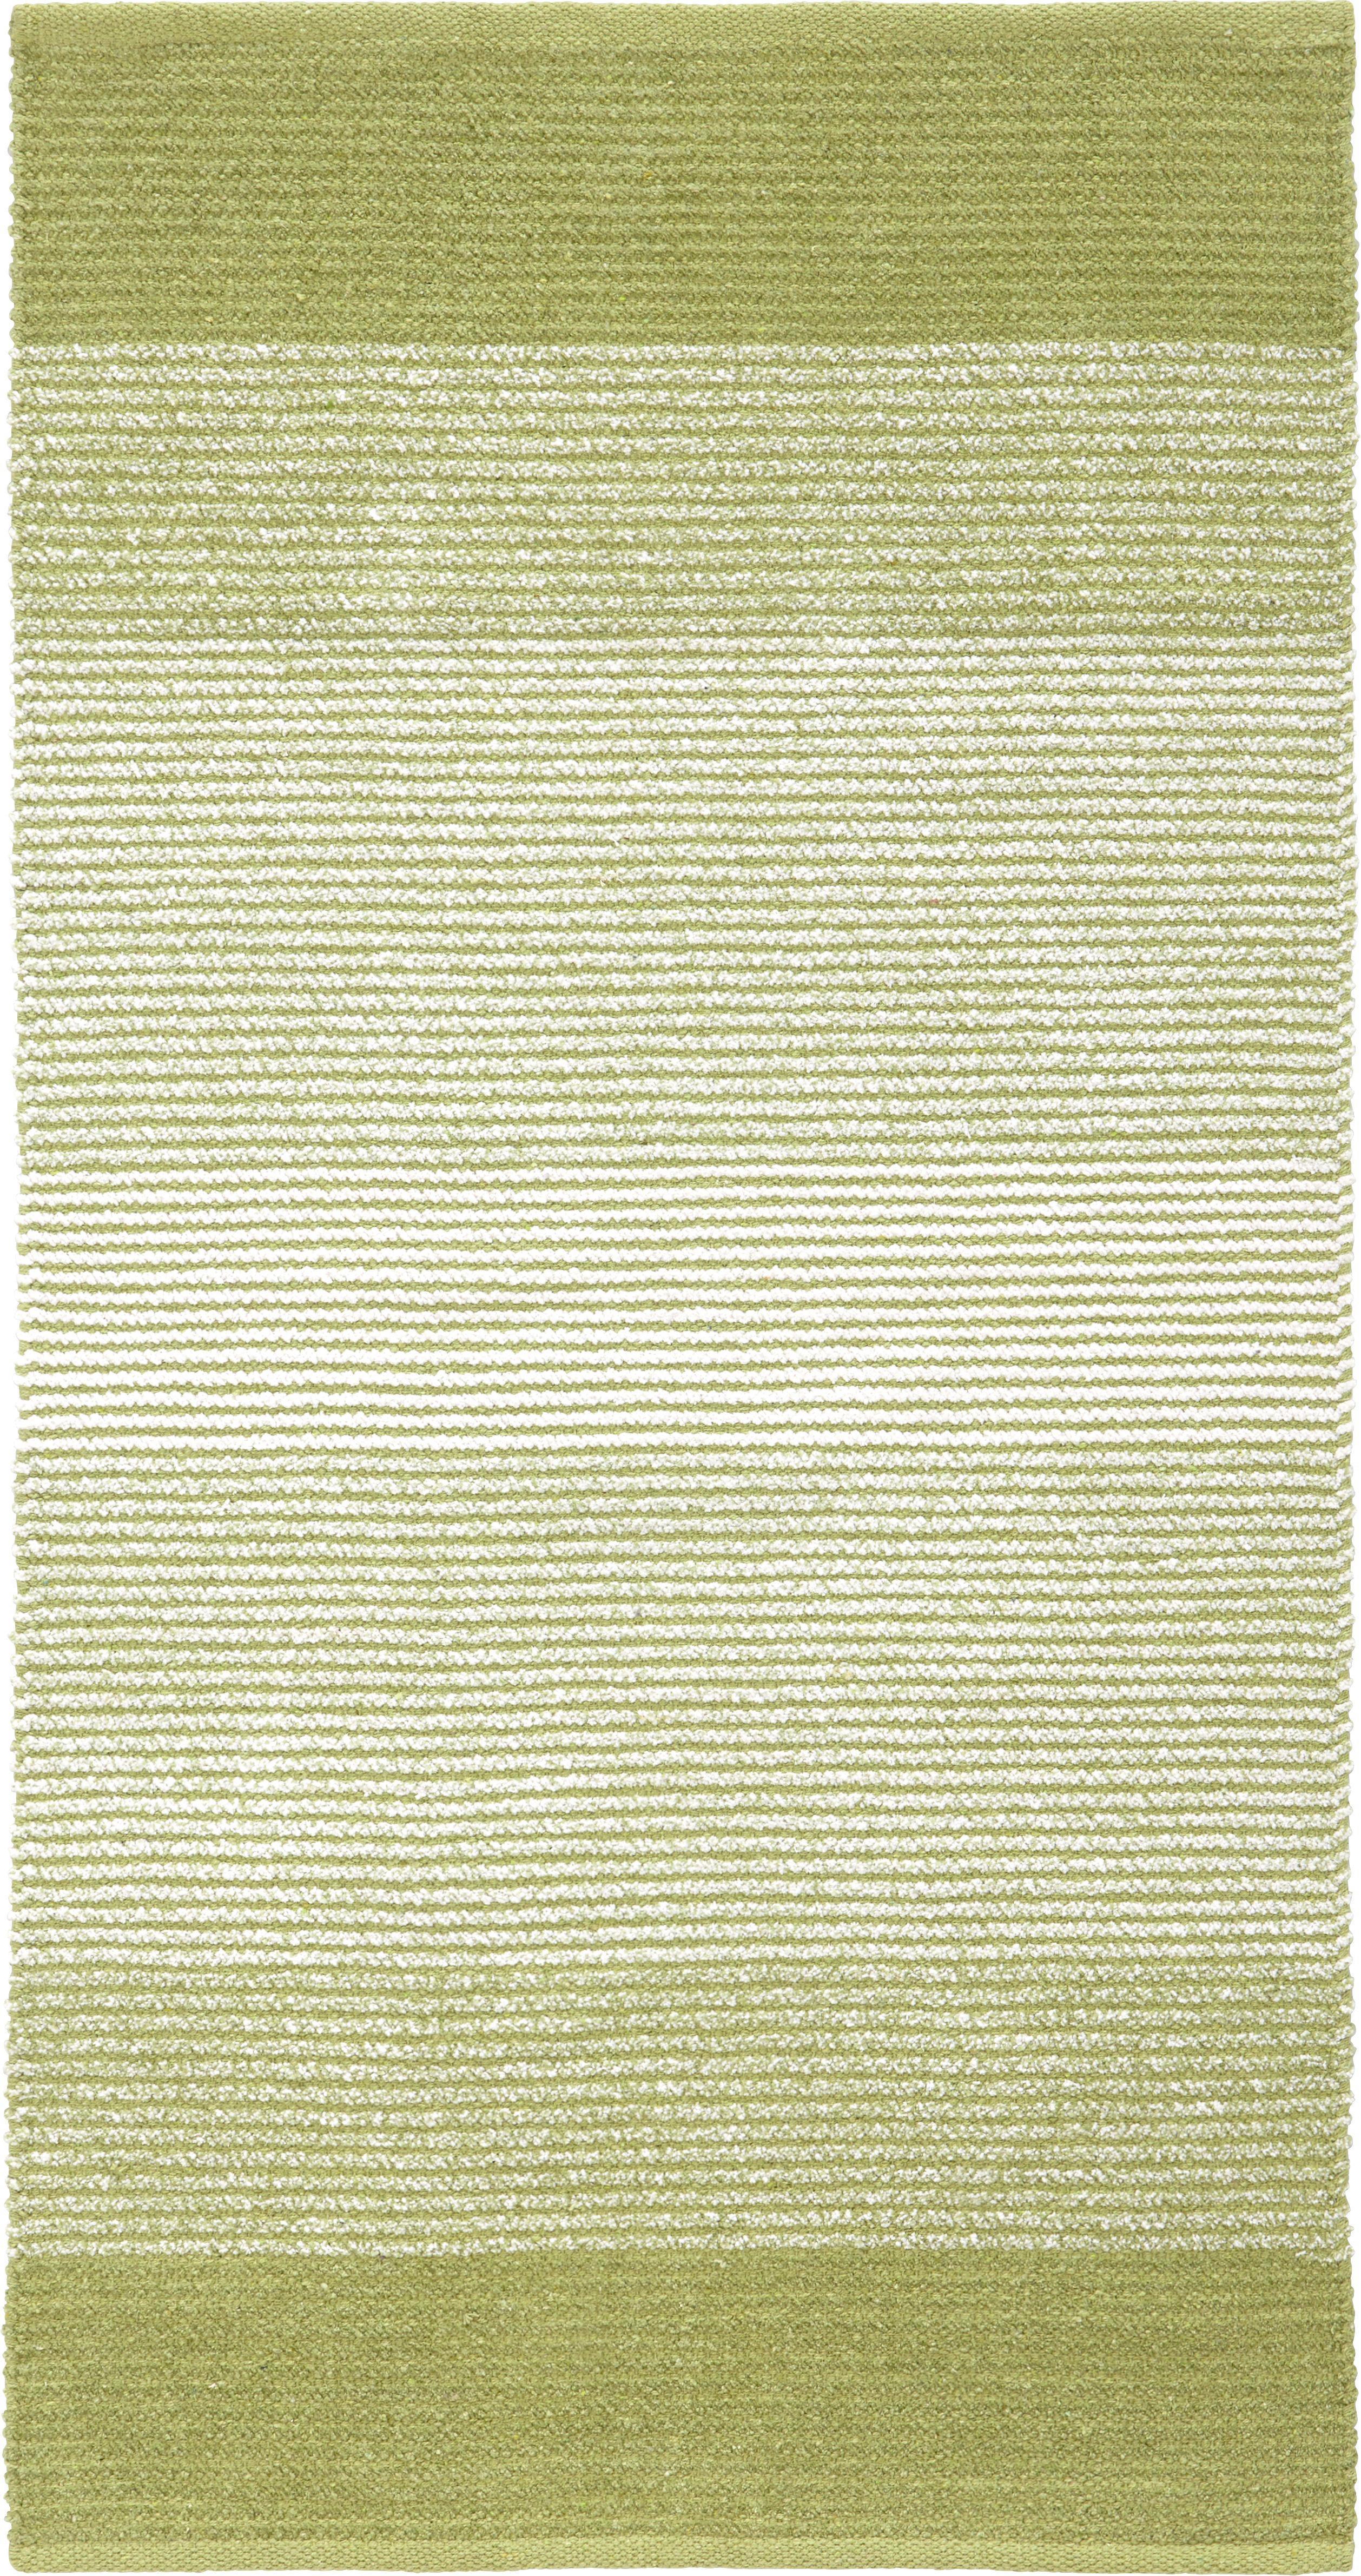 Fleckerlteppich Malto - Grün, MODERN, Textil (70/140cm) - MÖMAX modern living